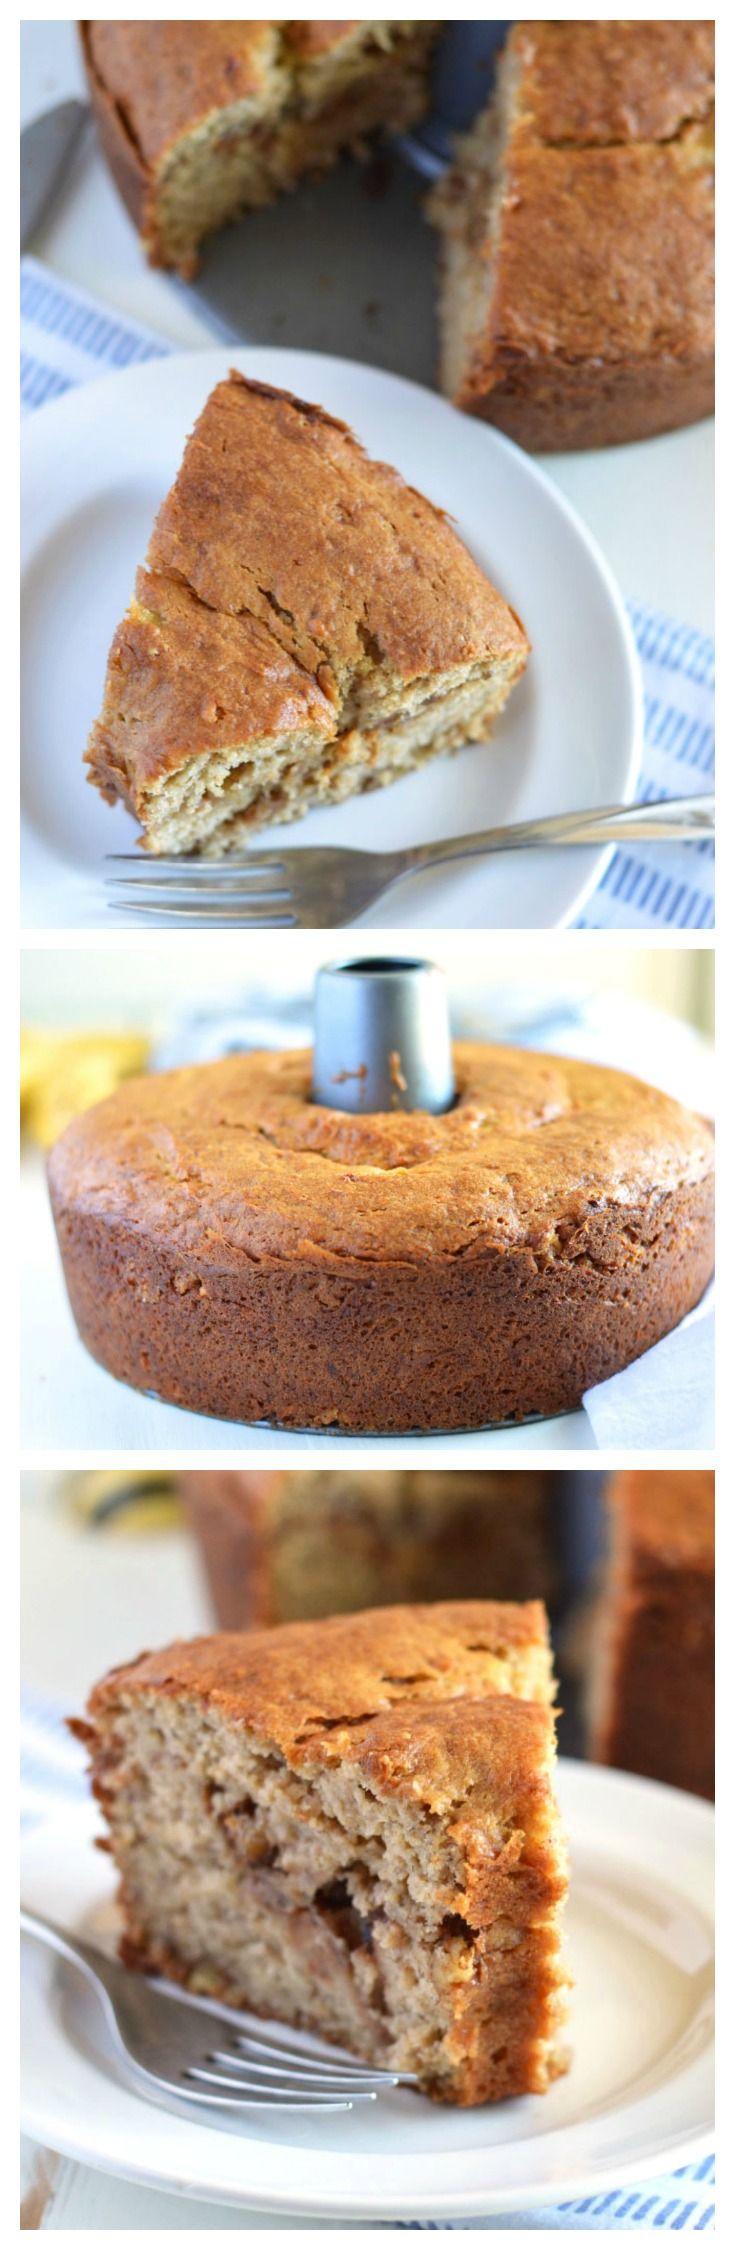 Honey Banana Coffee Cake from What The Fork Food Blog (gluten free and dairy free) | @WhatTheForkBlog | whattheforkfoodblog.com #sponsored #TLHoneyGranulesCG